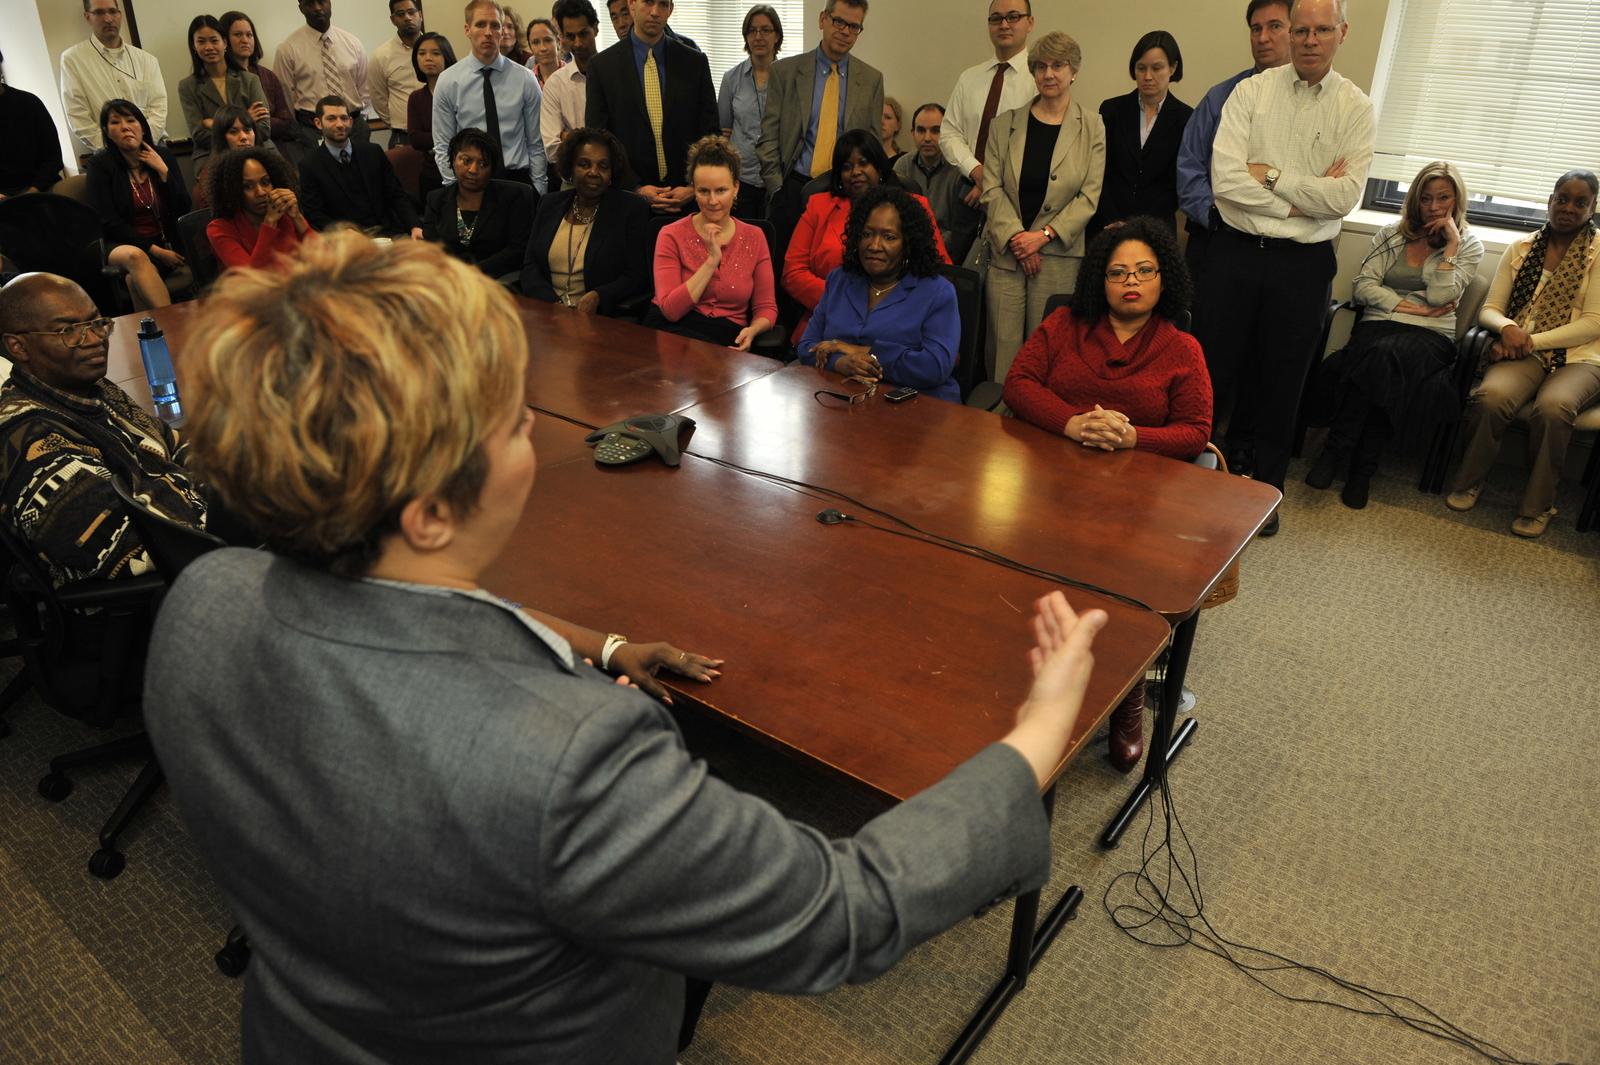 Office of the Administrator - Lisa Jackson's Farewell Tour [412-APD-1115-2013-02-07_FarewellTour_176.JPG]